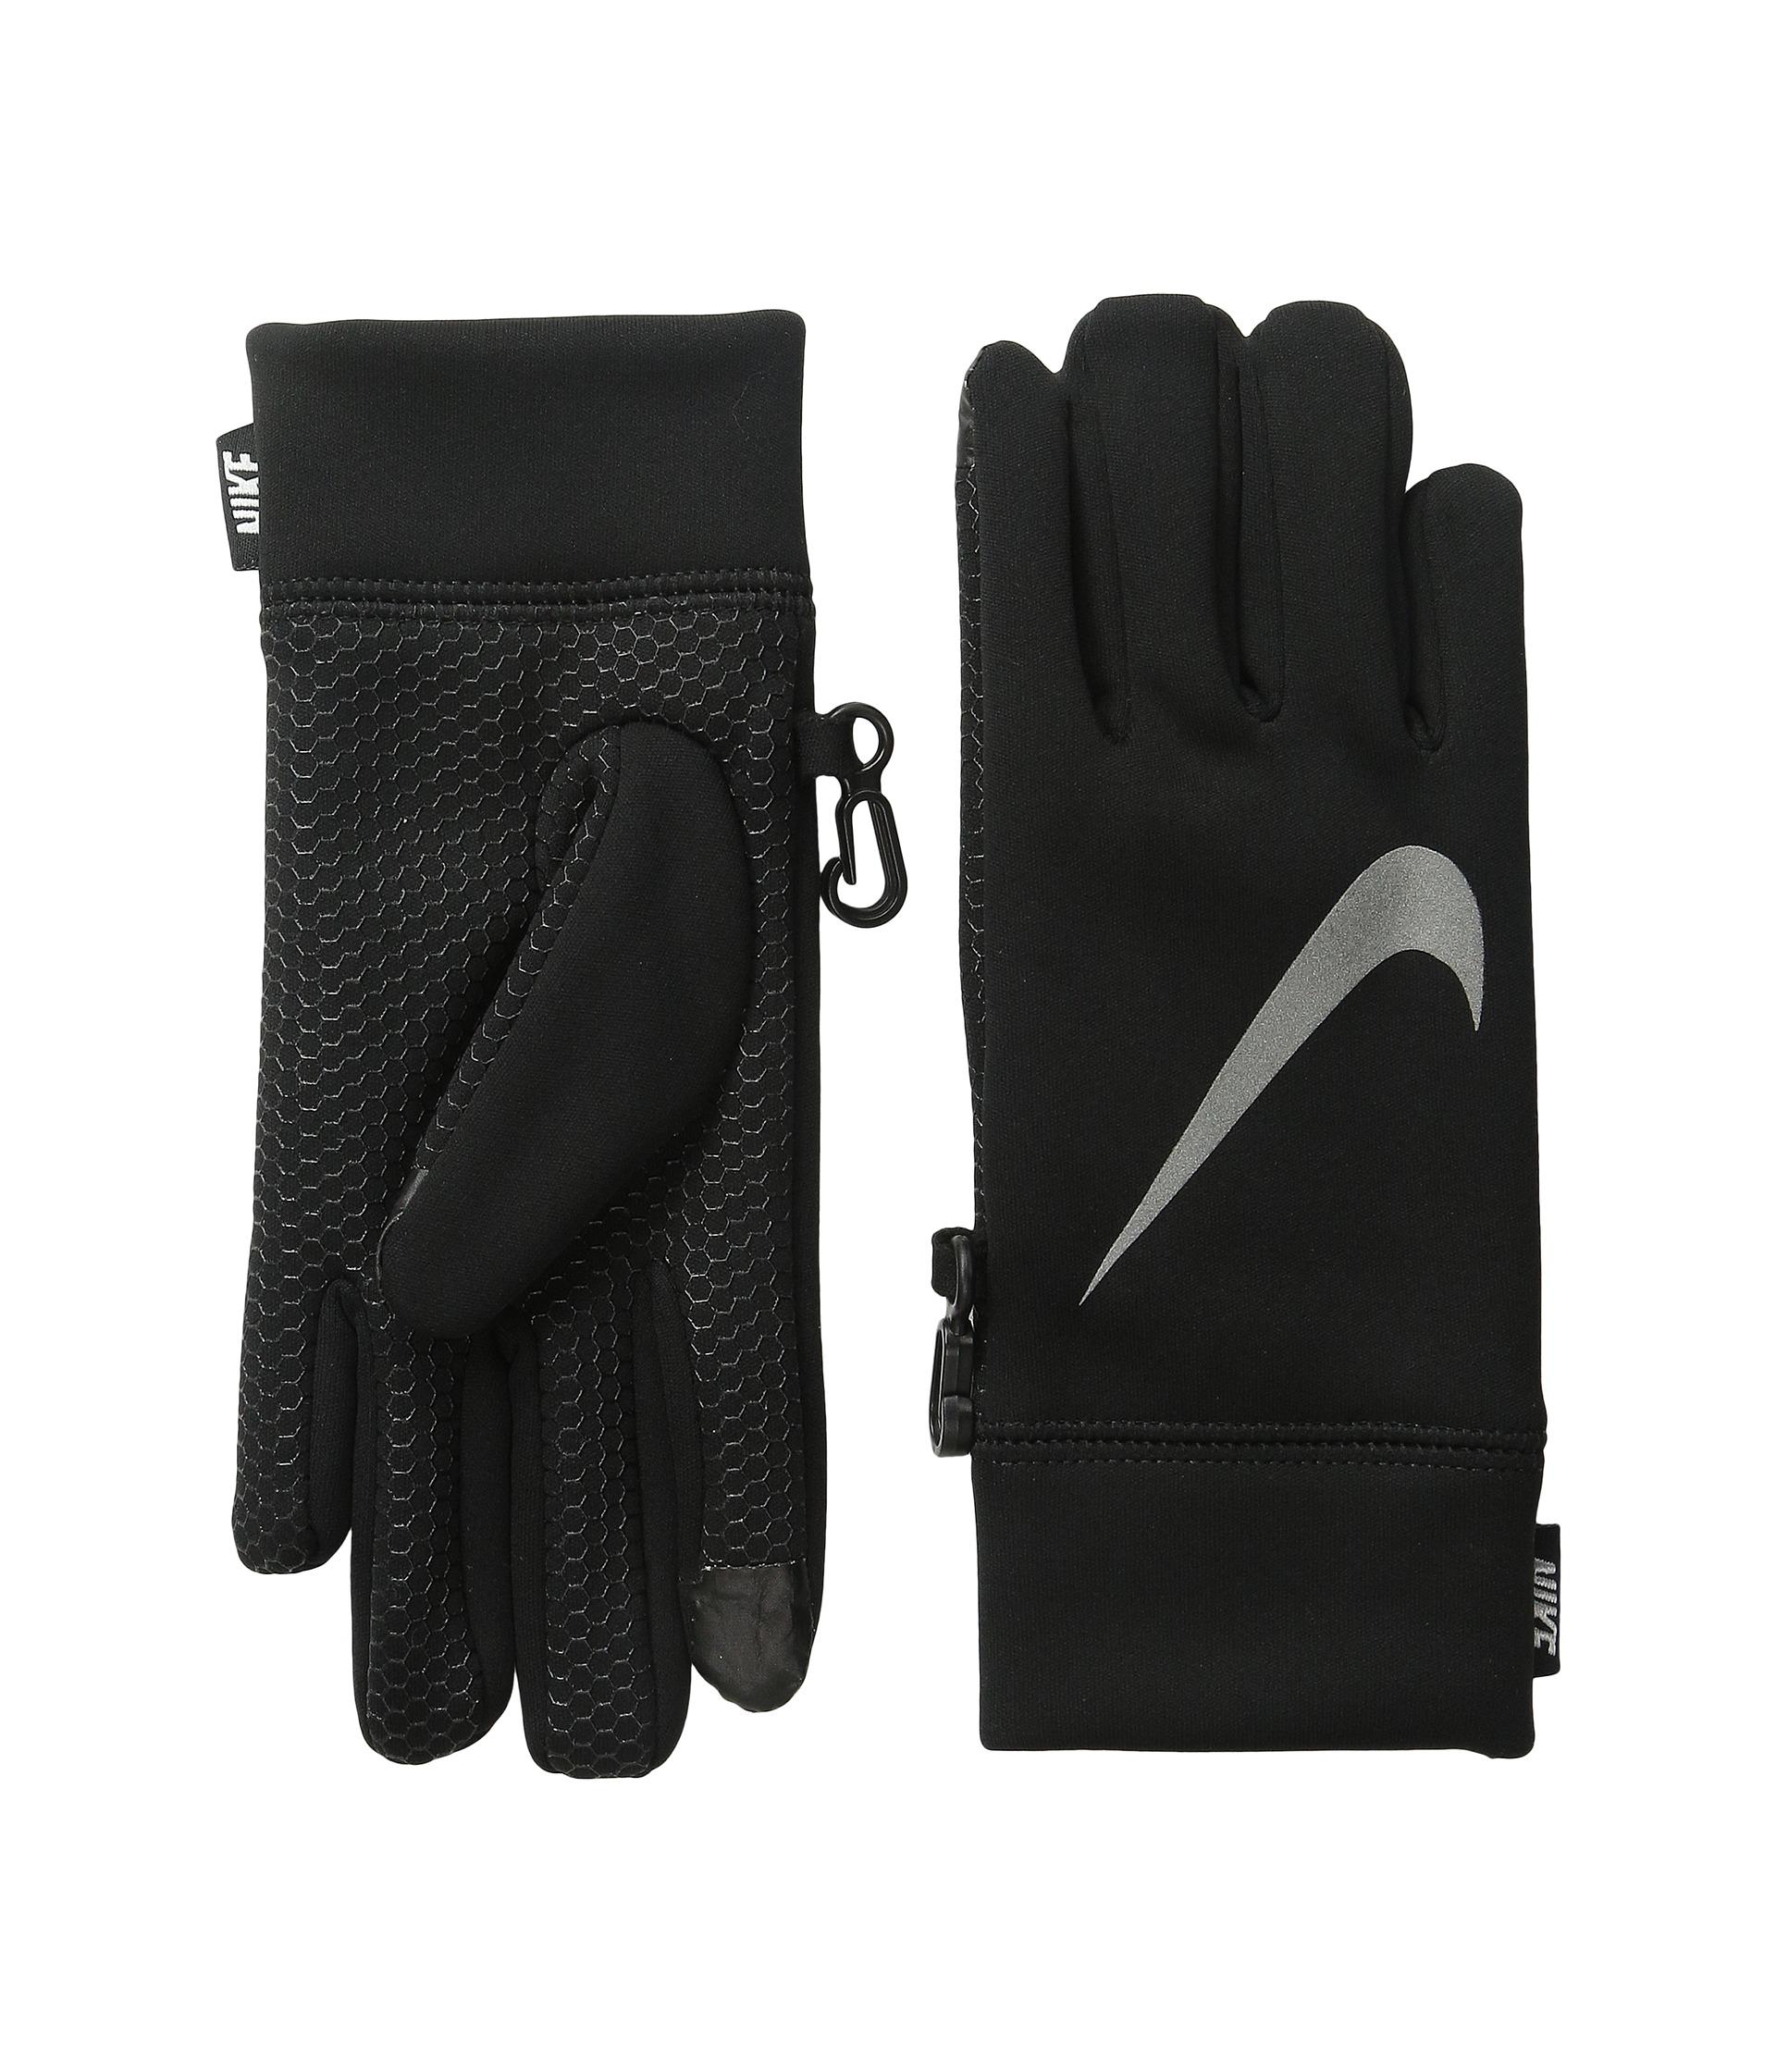 Nike Gloves Touch Screen: Nike Kids Therma Reflect Glove (Big Kids)